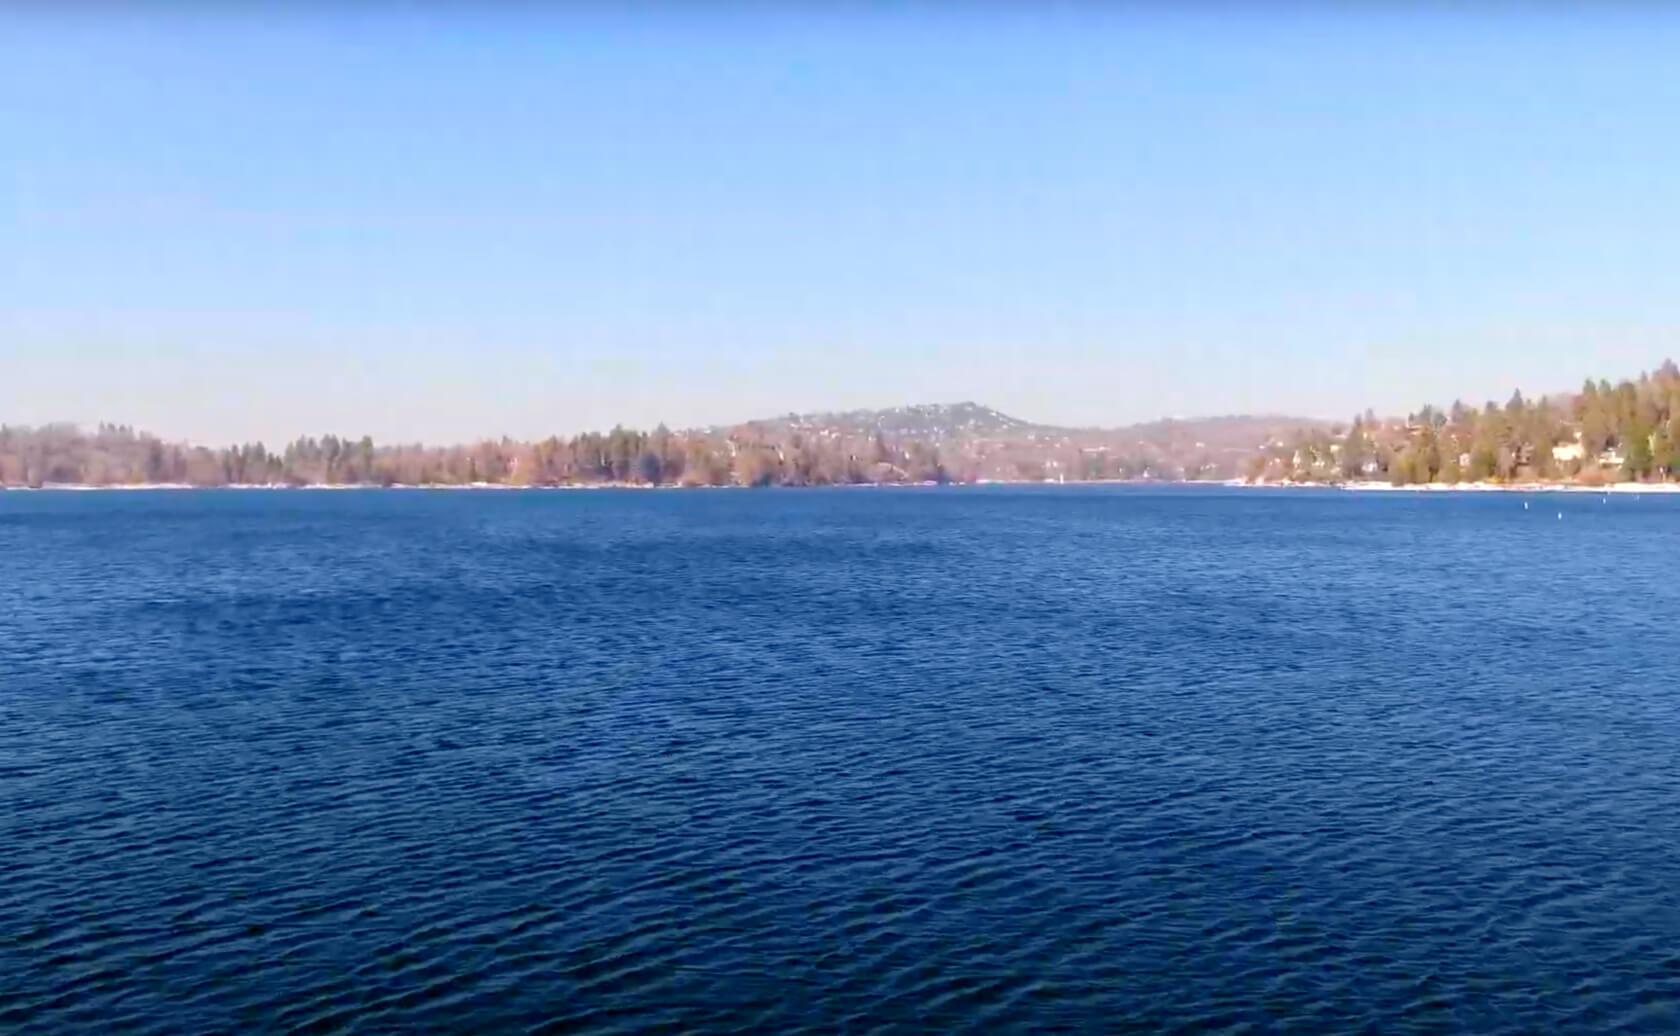 Lake-Arrowhead-CA-Fishing-Guide-03